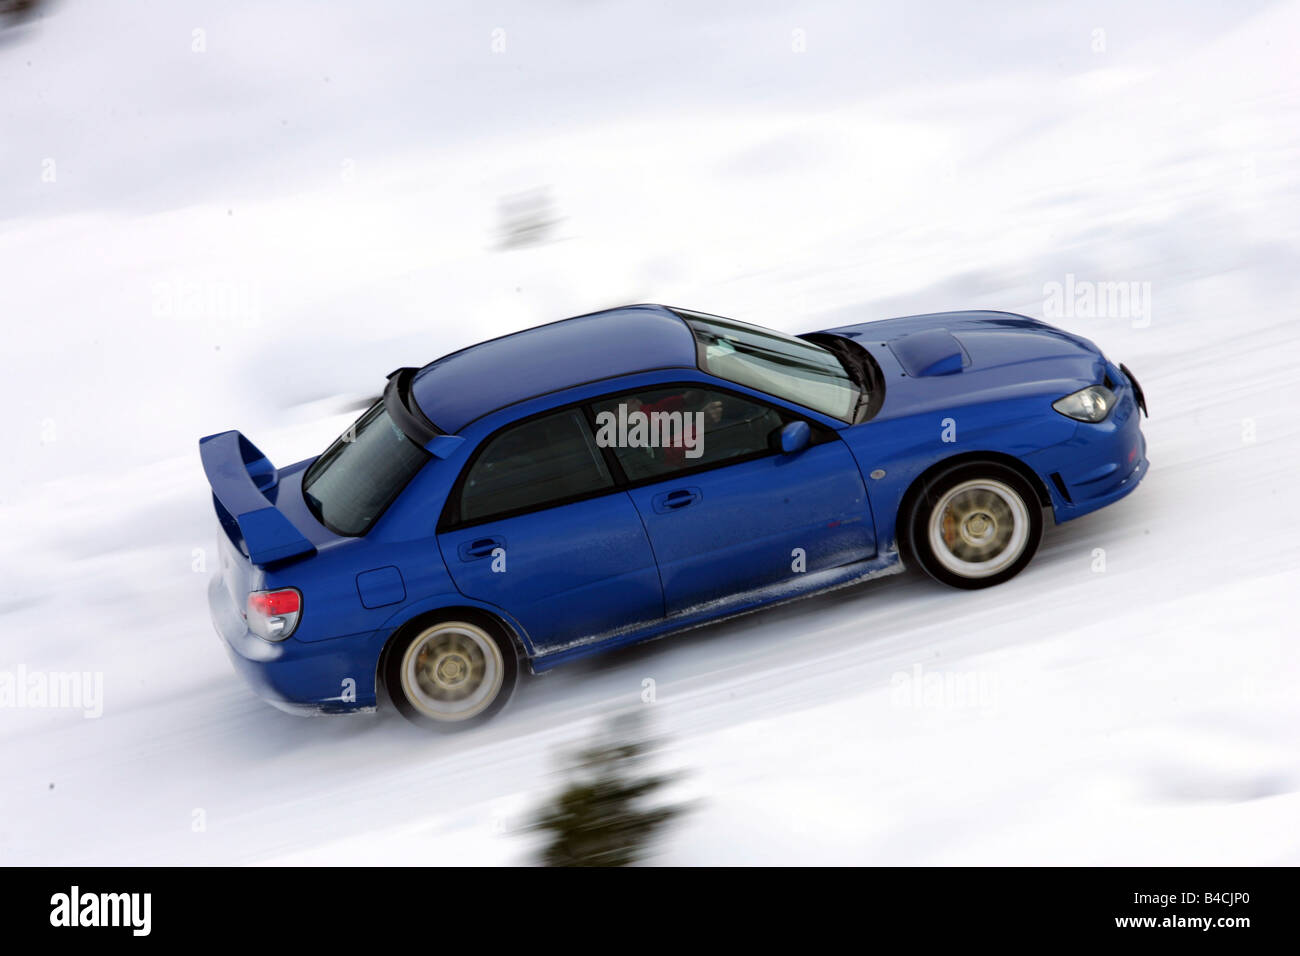 Subaru Impreza 2.5 WRX STi, model year 2005-, blue moving, side ...